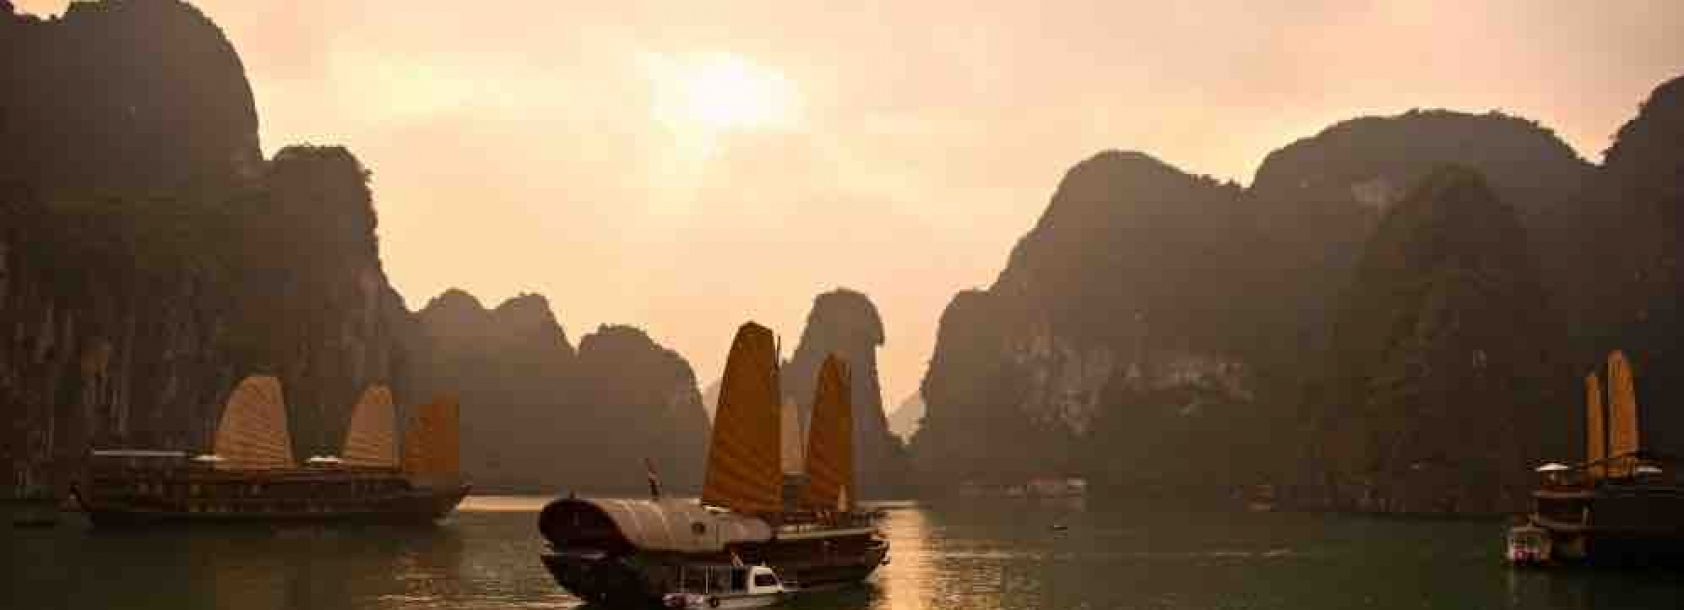 Vietnam_Halong Bay